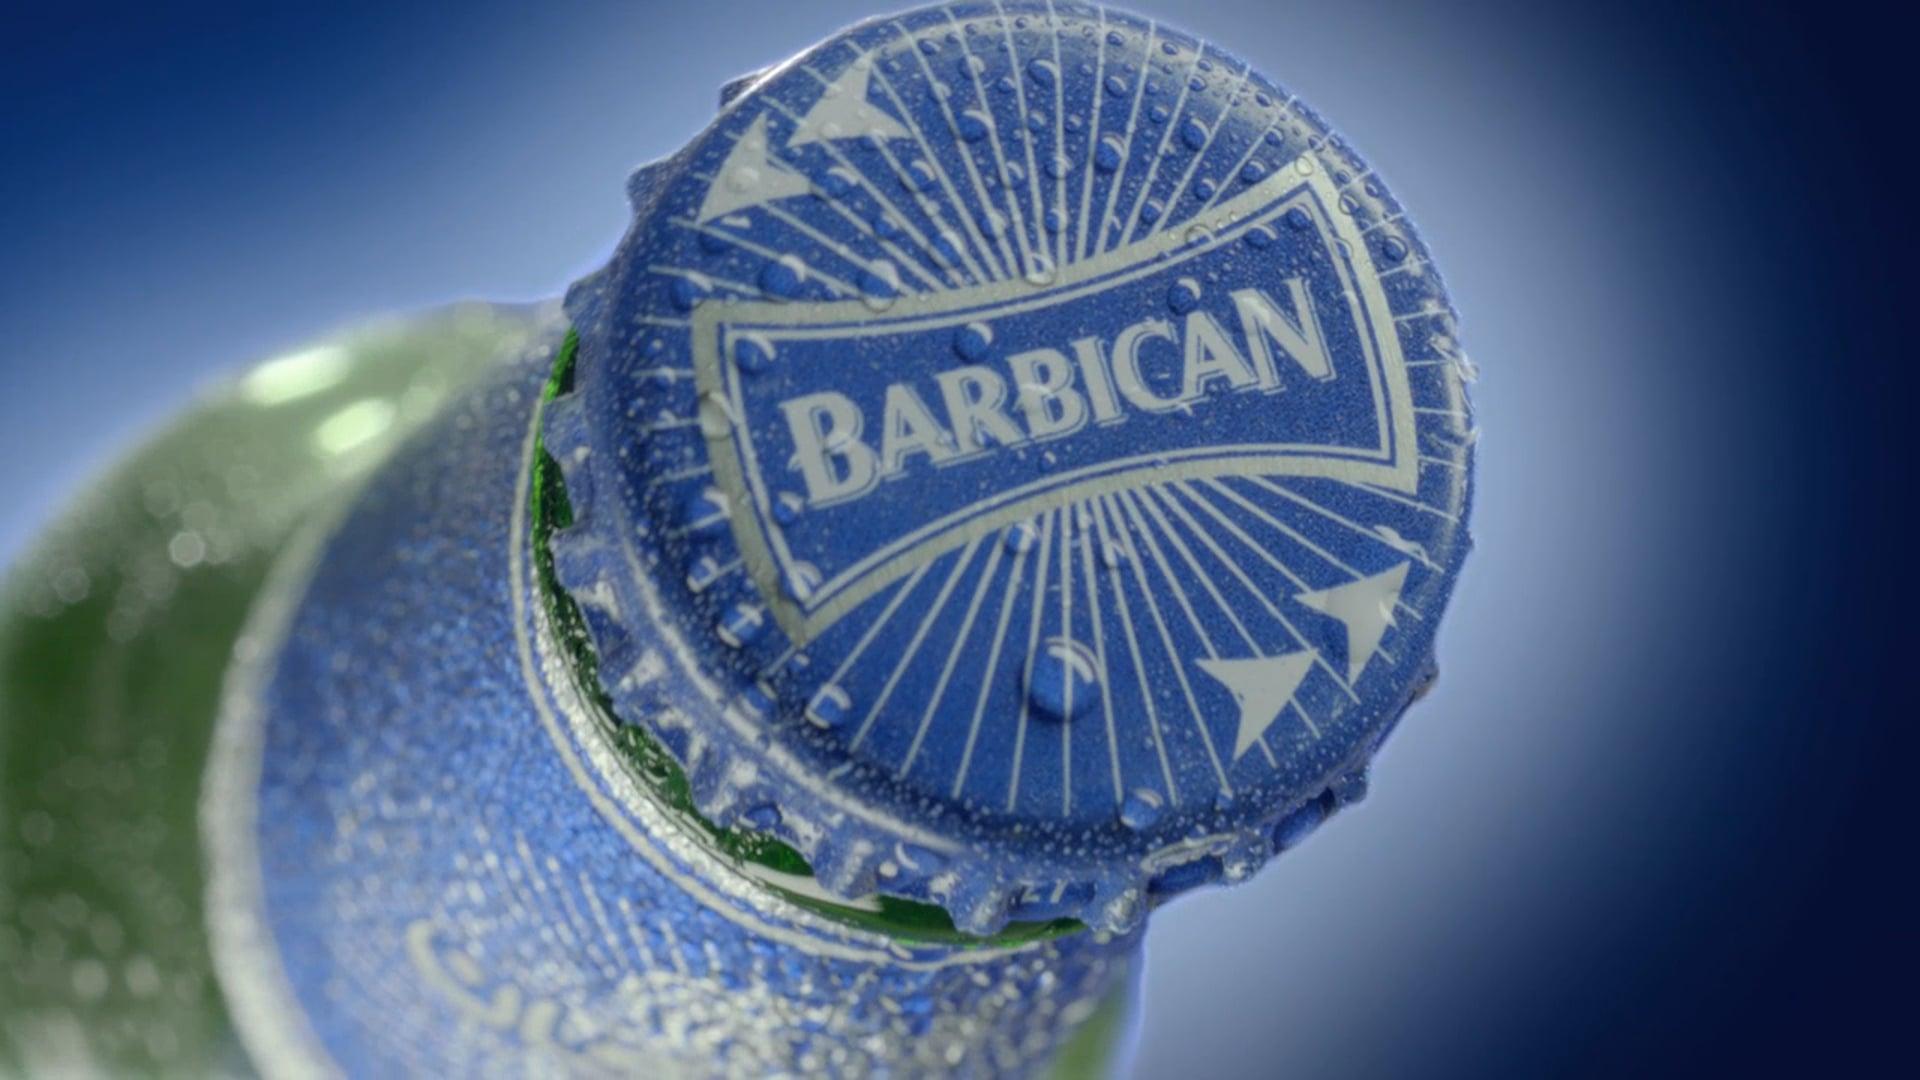 Barbican New Bottle Launch